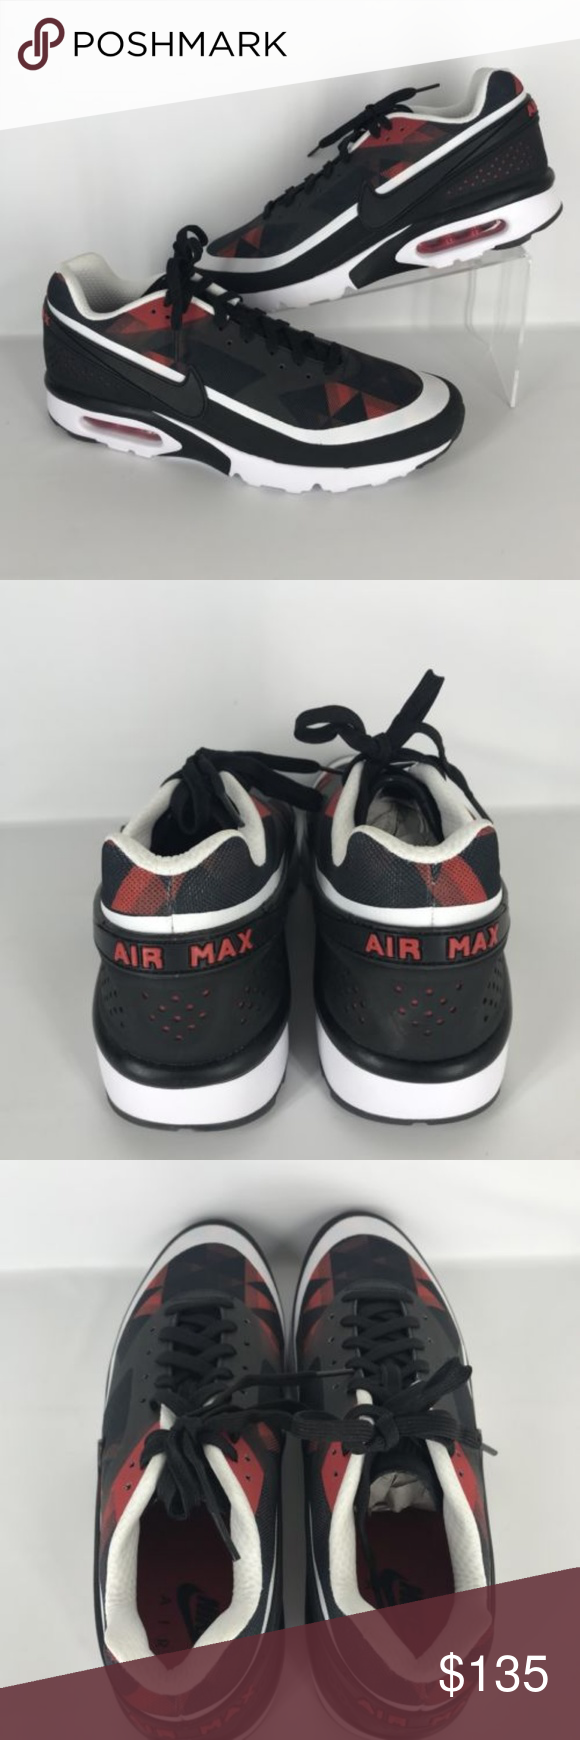 brand new d2150 74009 Nike Air Max Classic BW Ultra Graphic Shoes Nike Air Max Classic BW Ultra  Graphic Mens